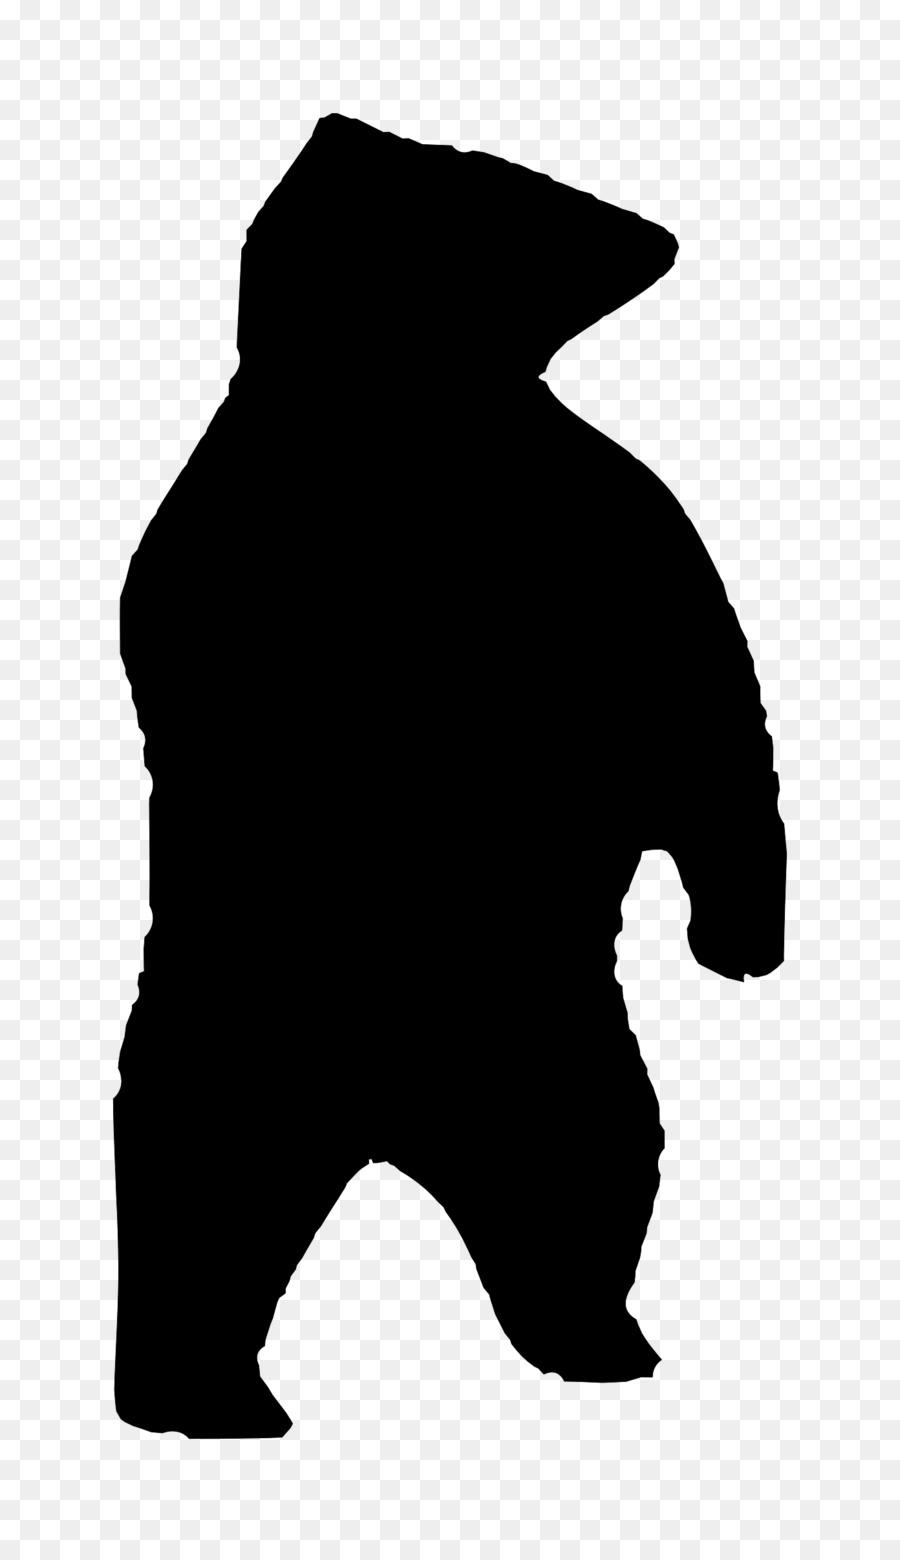 900x1560 Polar Bear American Black Bear Silhouette Clip Art